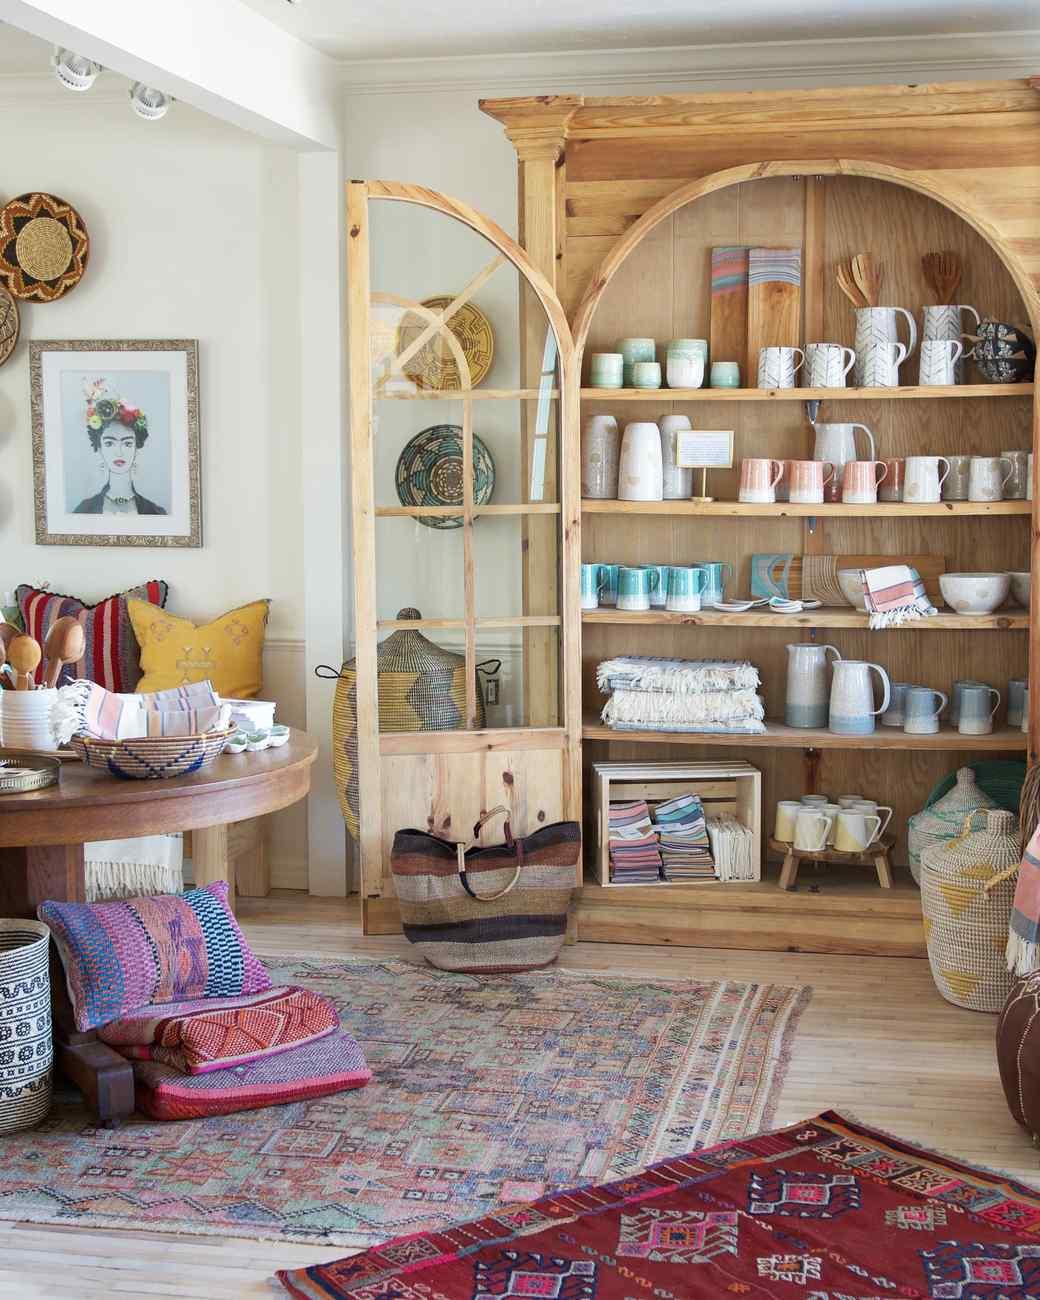 sister-golden-shop-interior